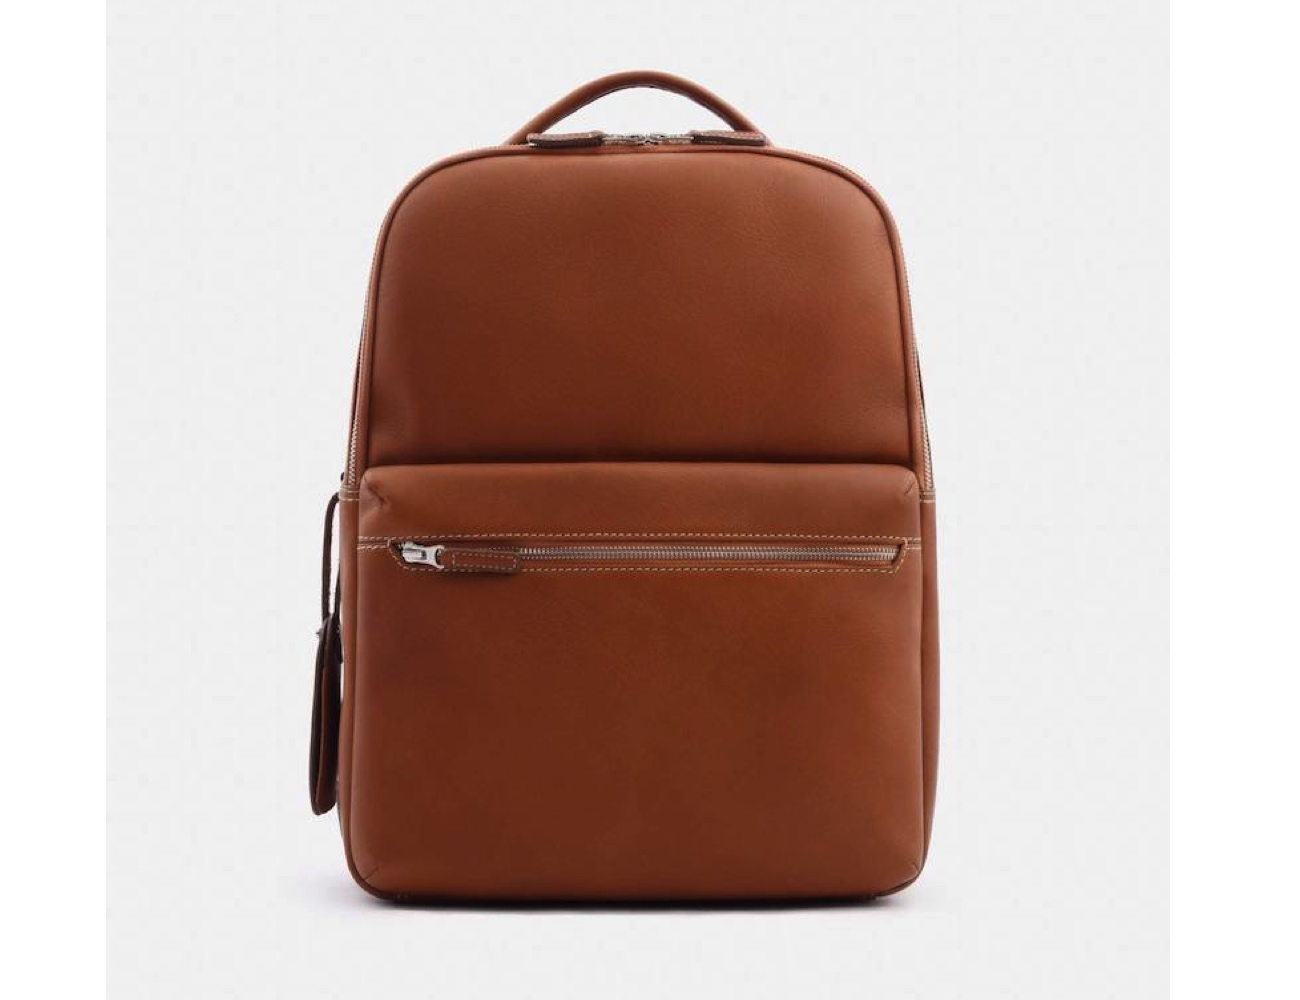 Beckett Simonon Logan Leather Backpack